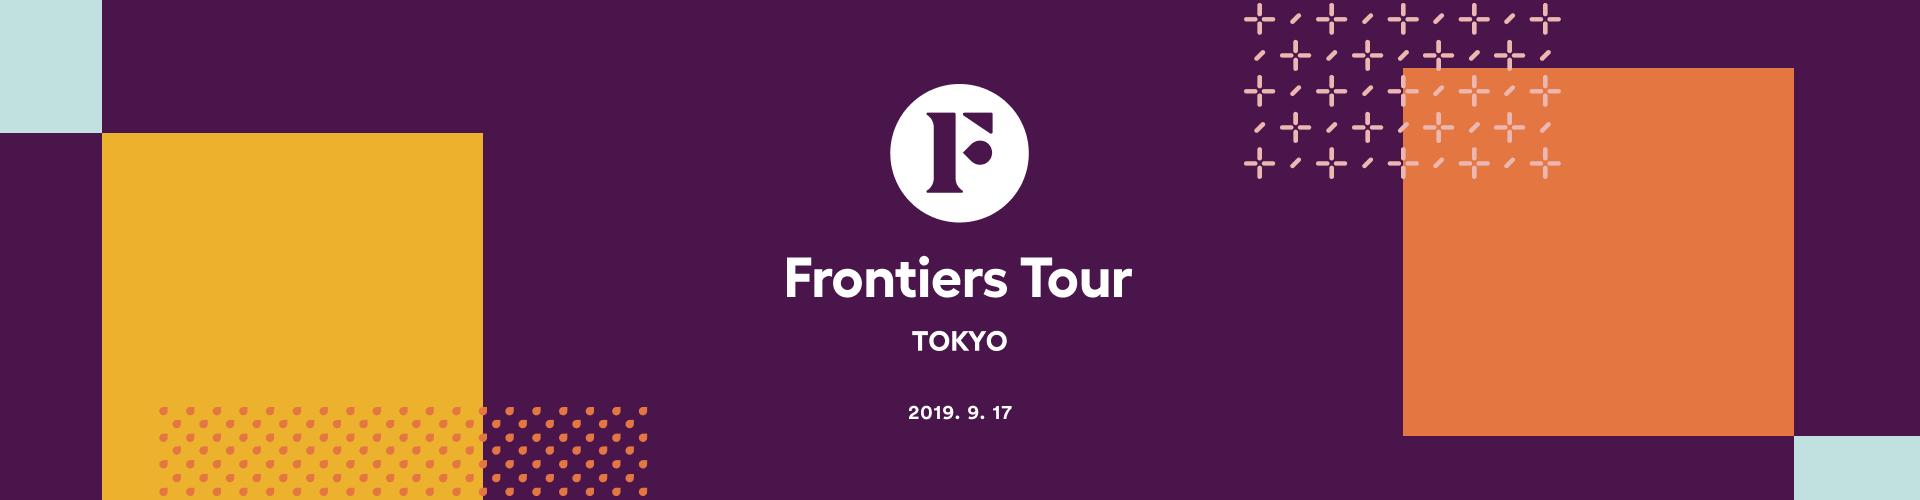 Frontiers Tour Tokyo